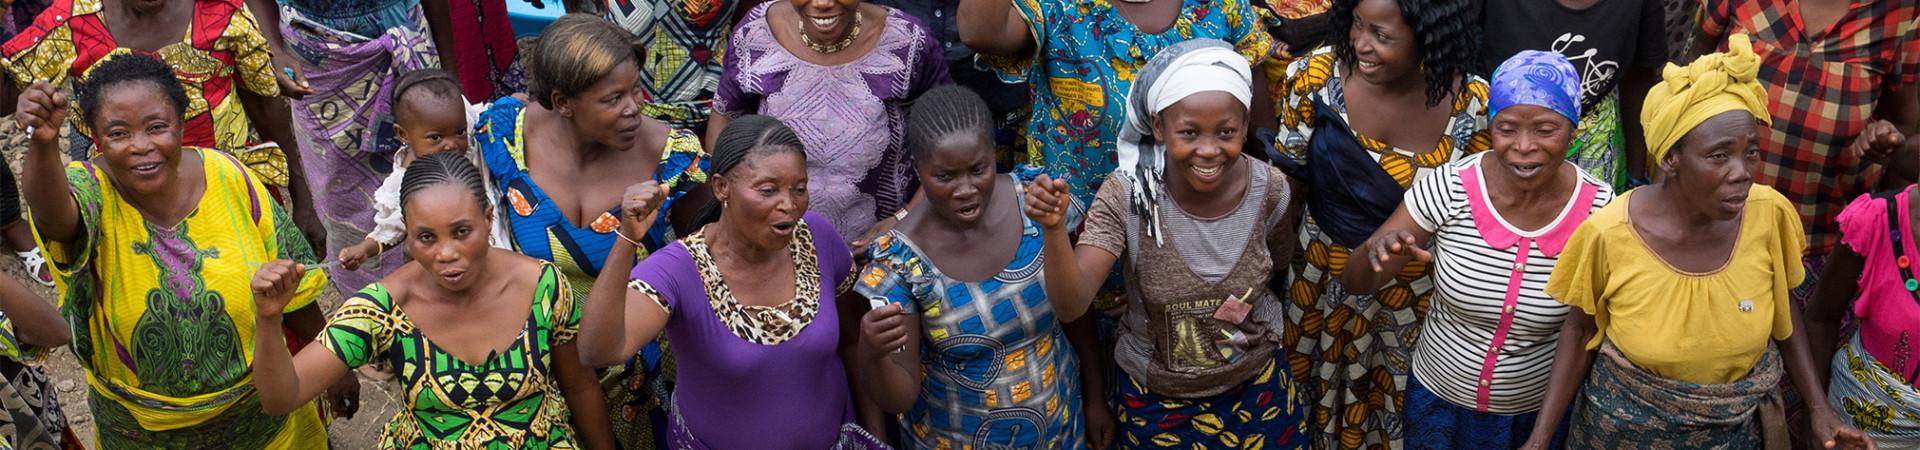 Womens-Human-Rights